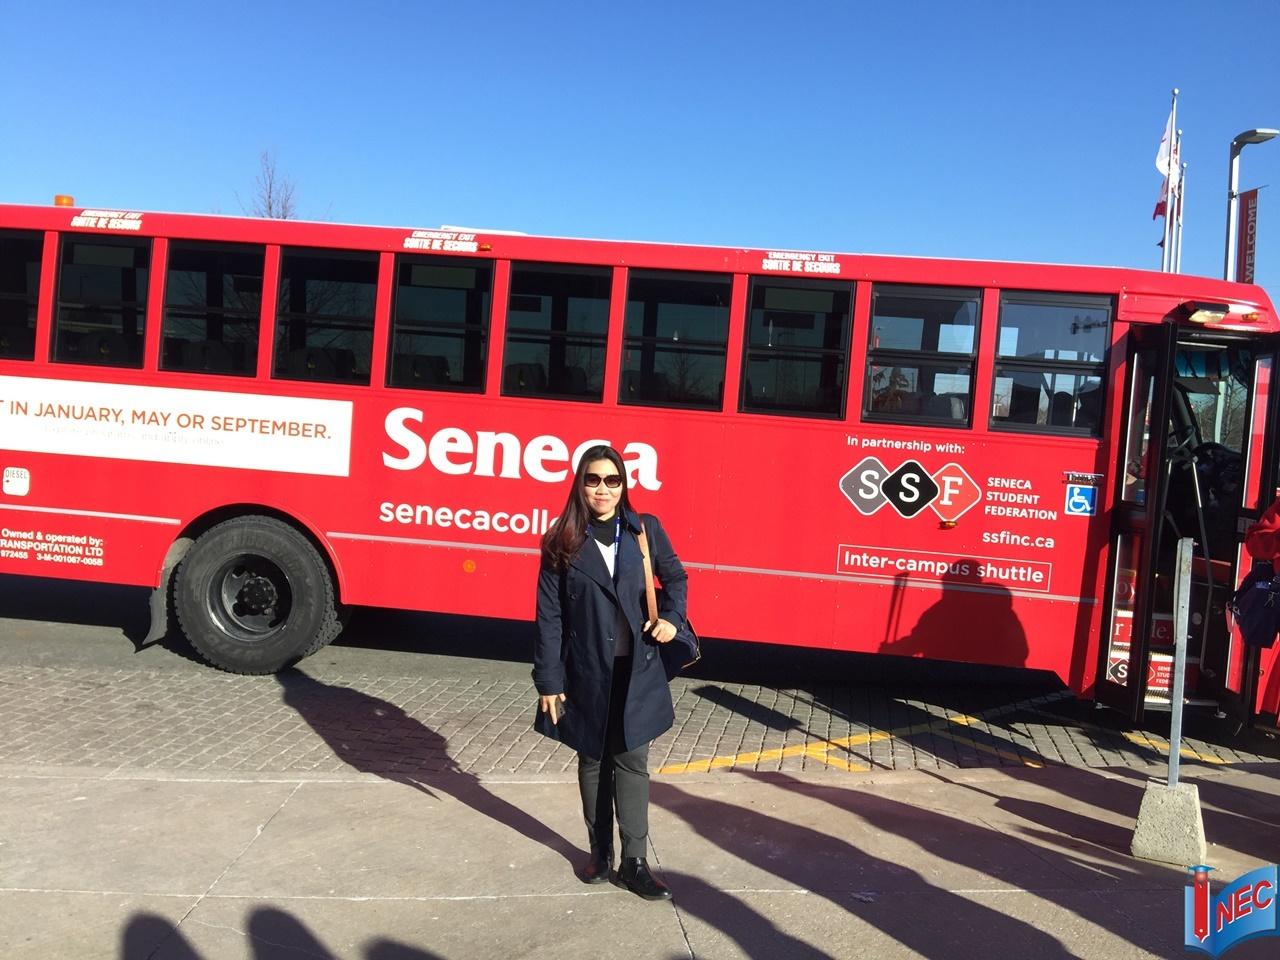 Du học INEC thăm Cao đẳng Seneca